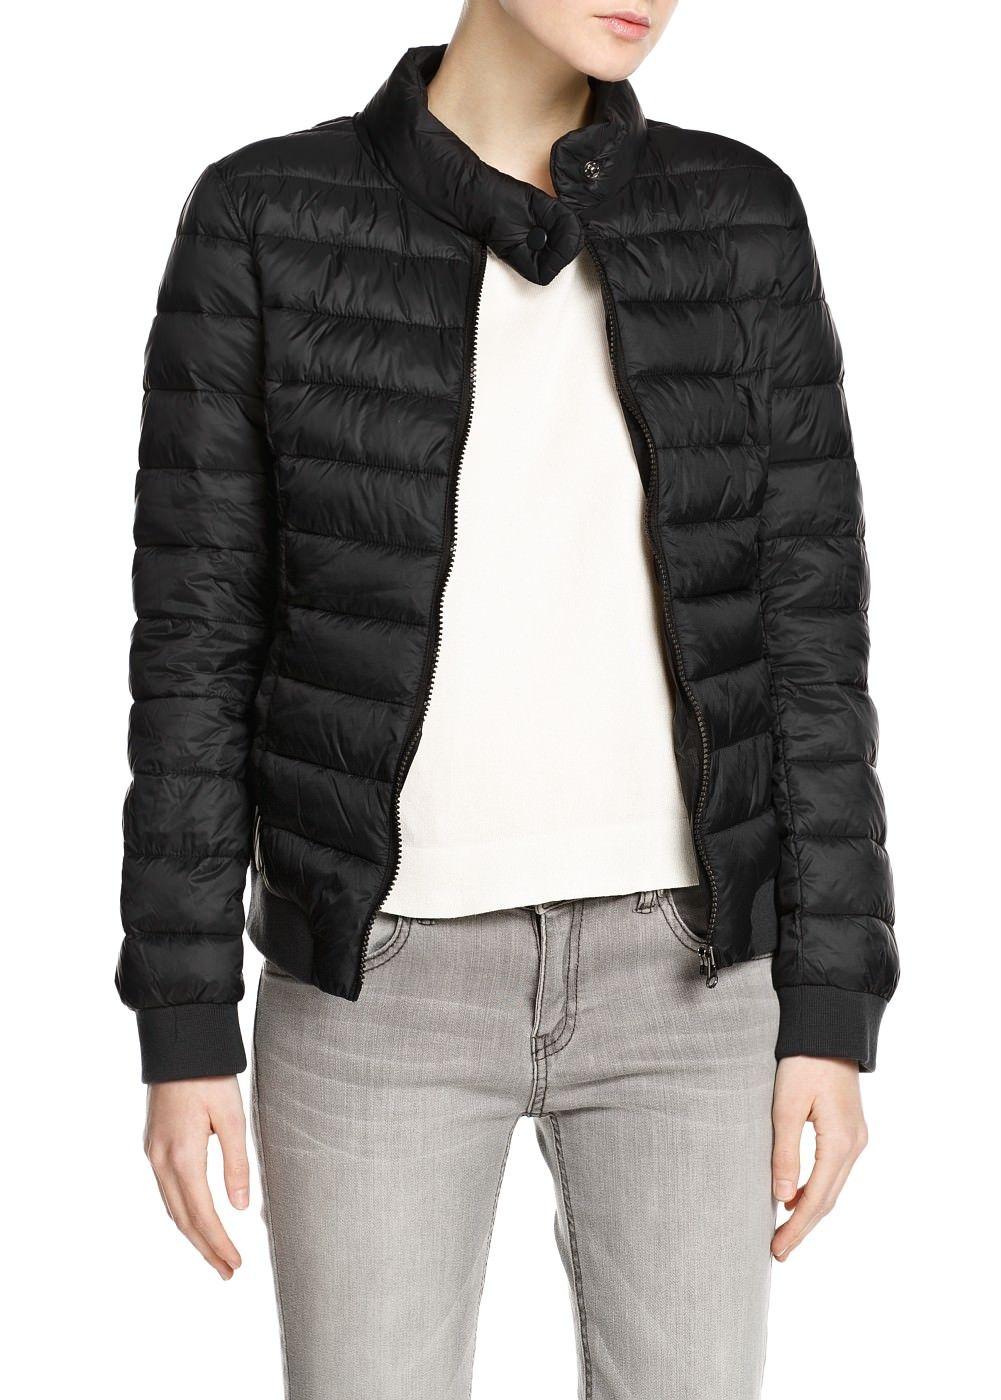 Ultra light foldable coat